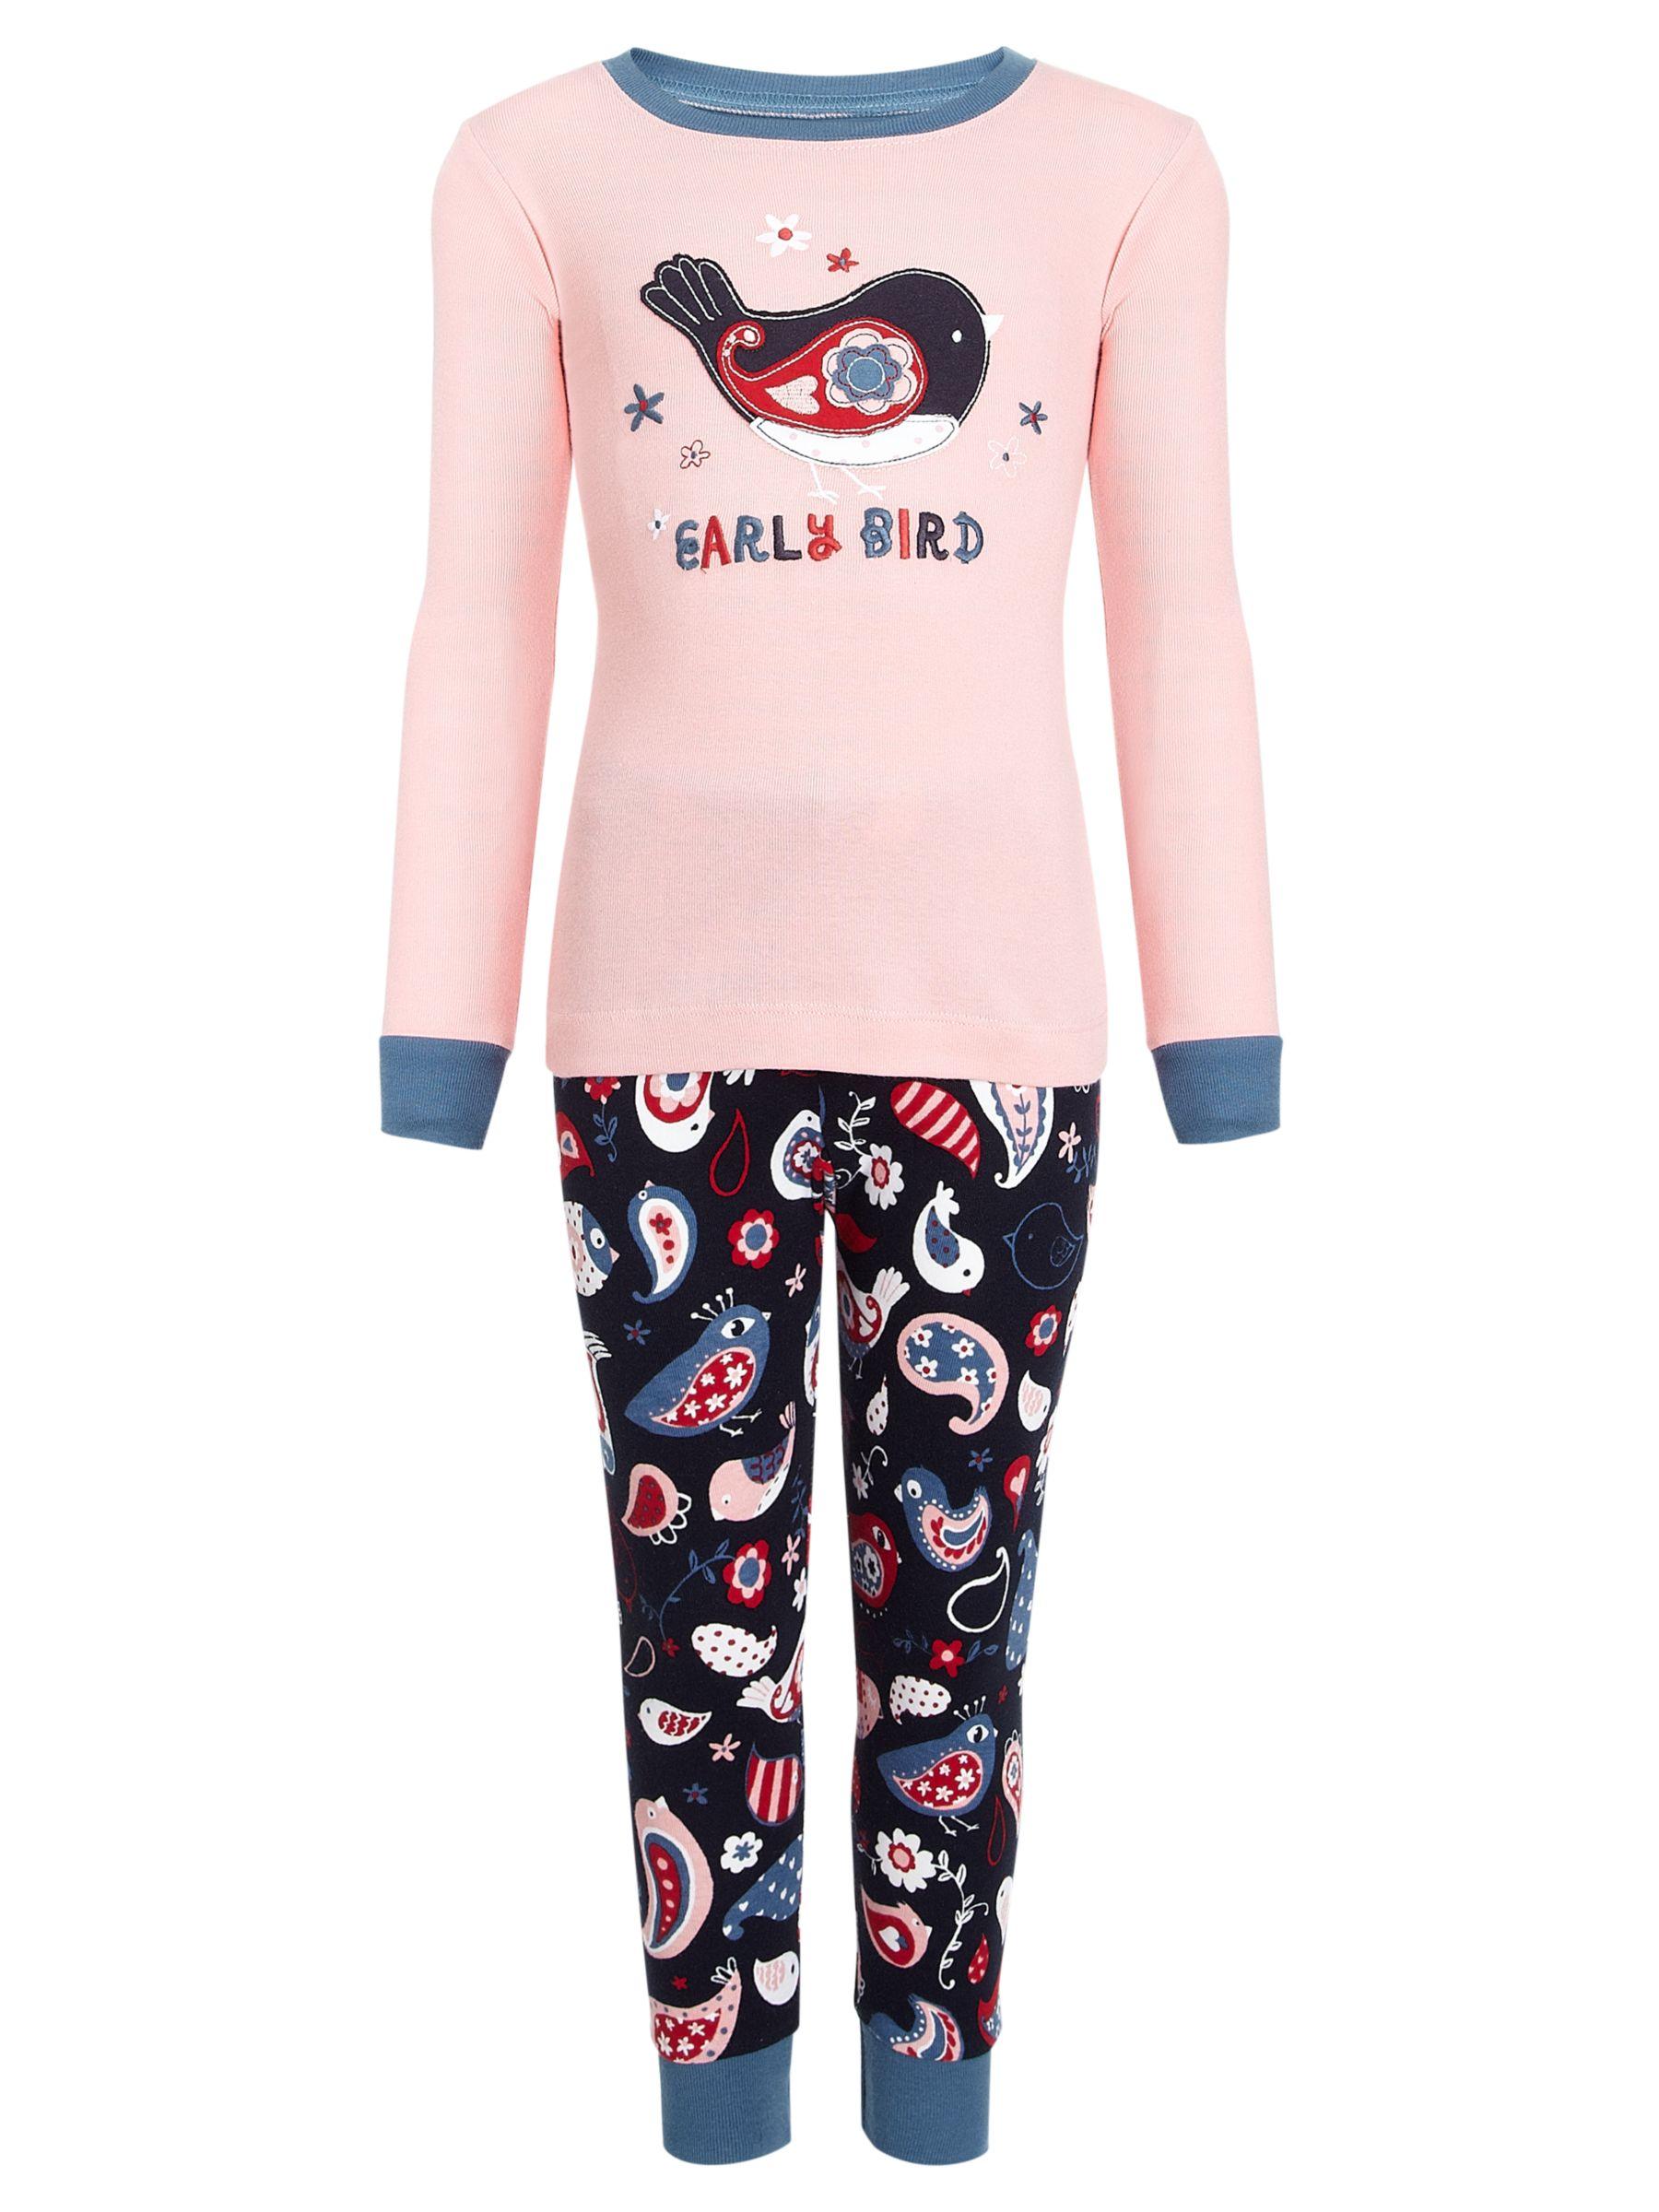 Hatley Early Bird Pyjamas, Pink/Navy